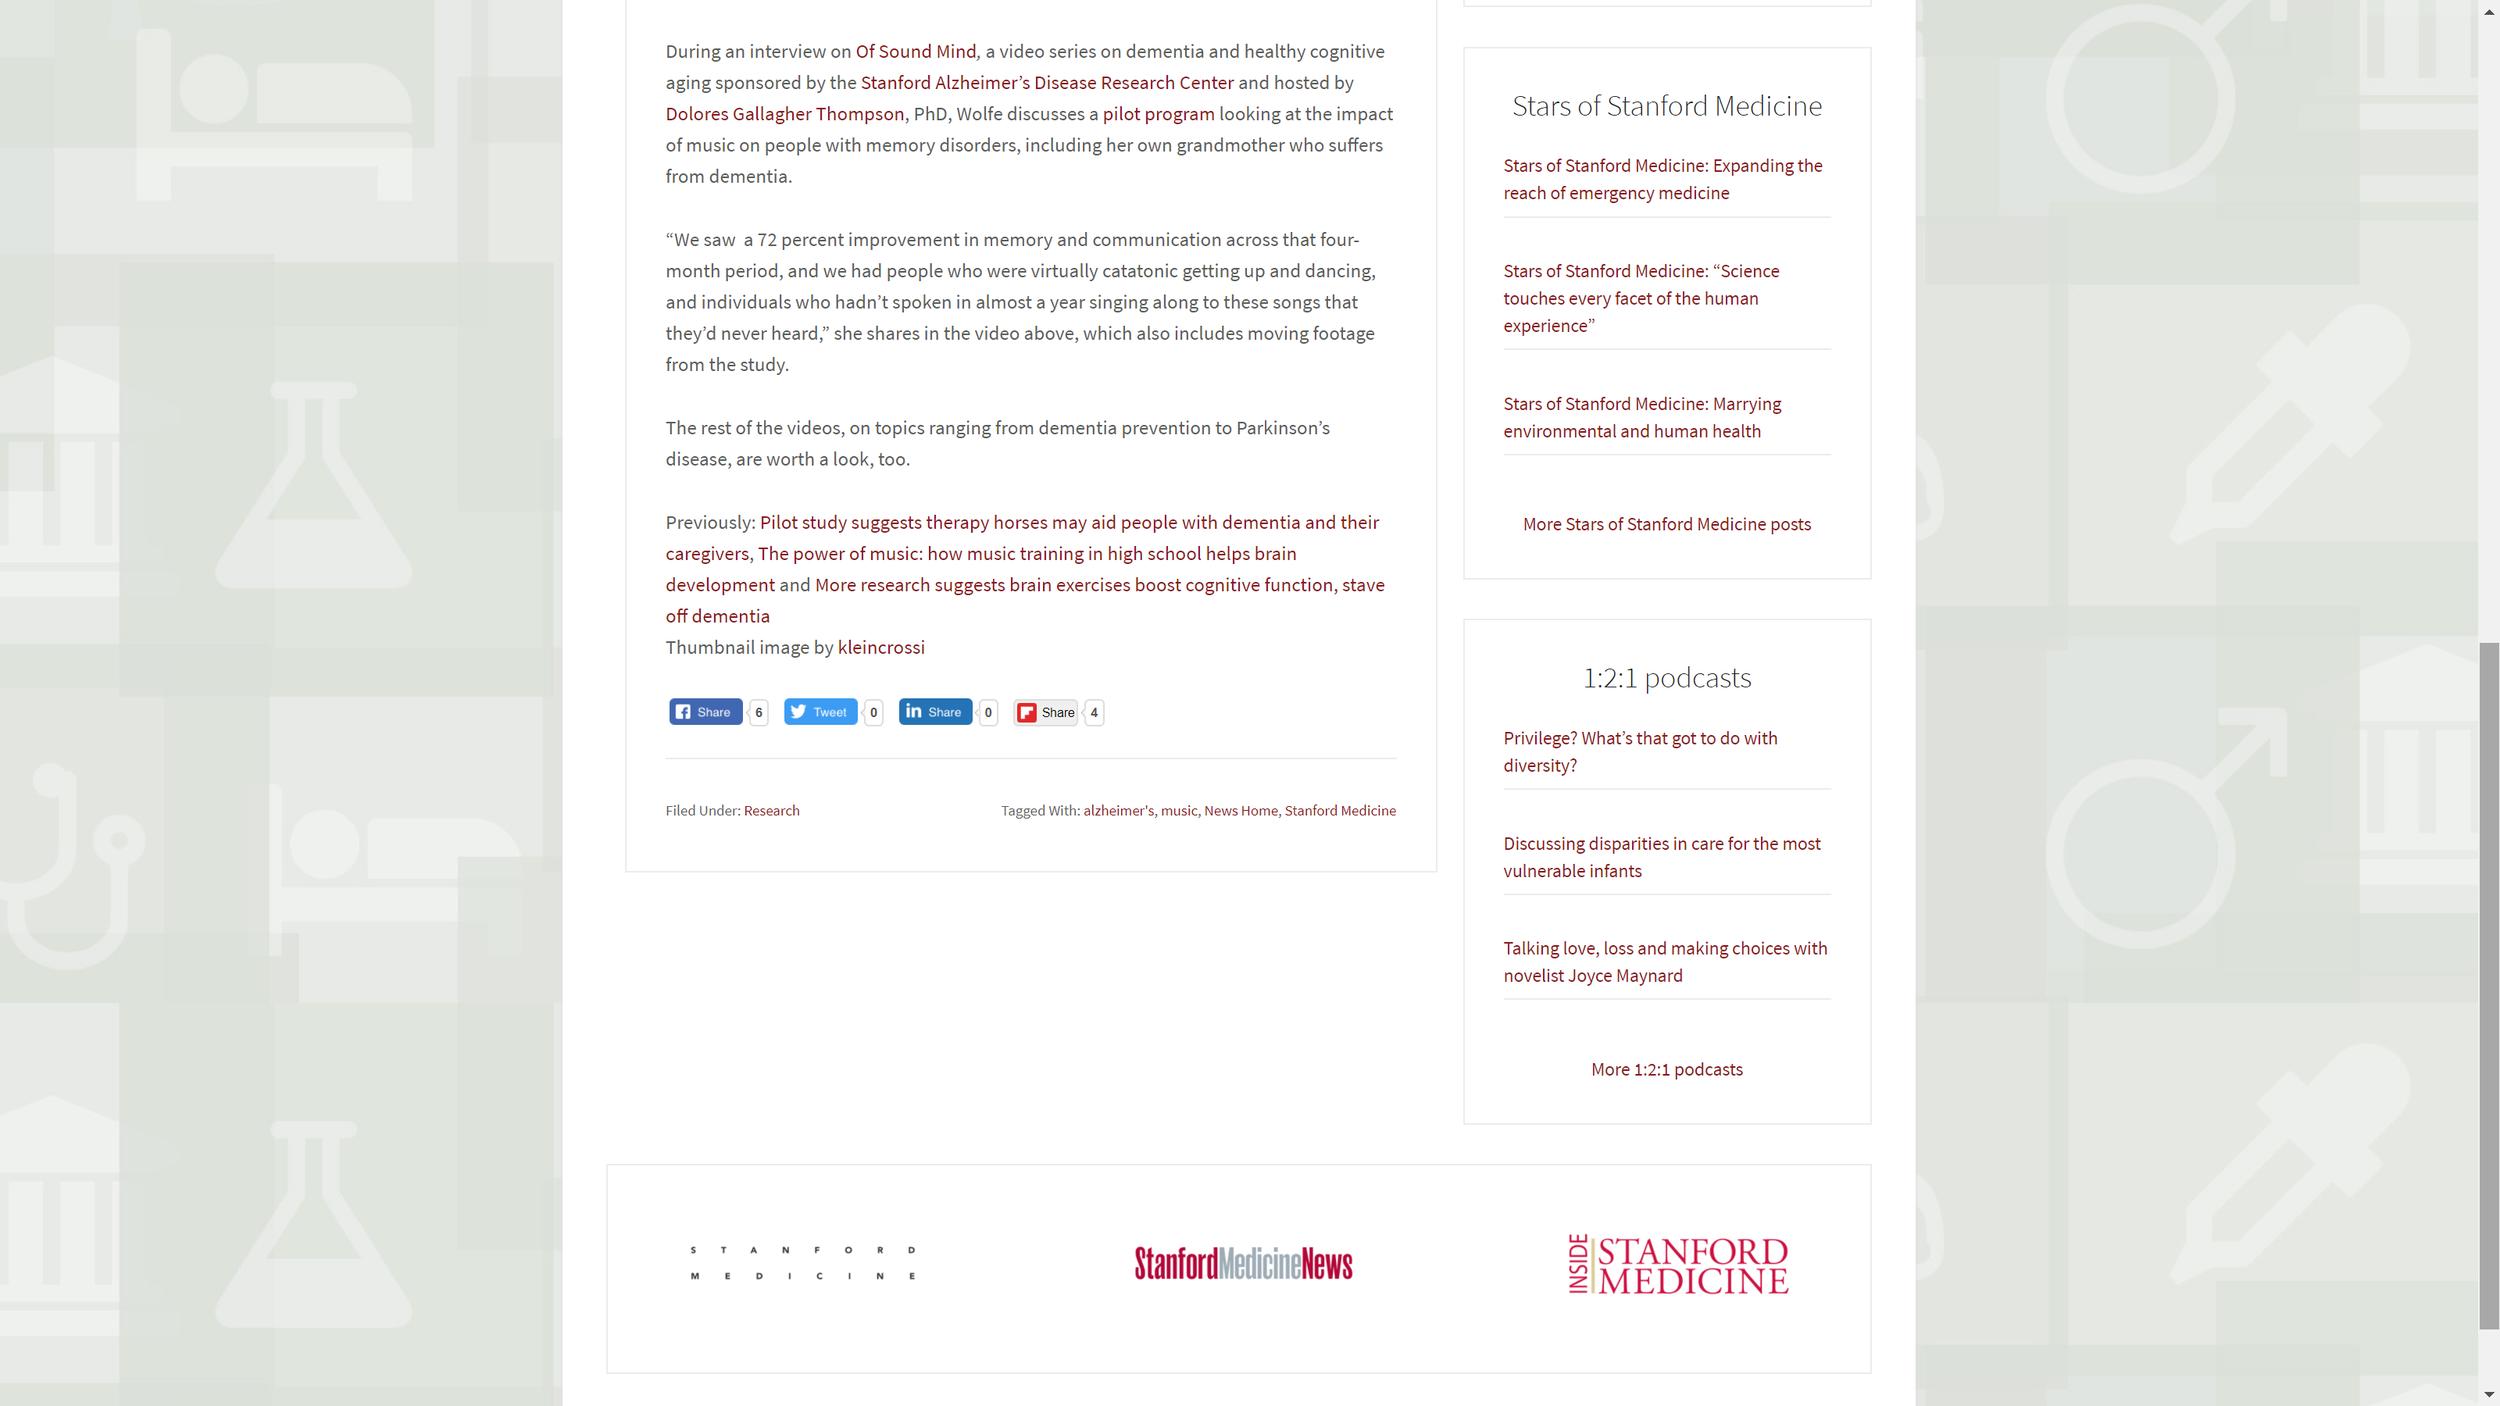 Stanford University School of Medicine Screen Grab prt 2